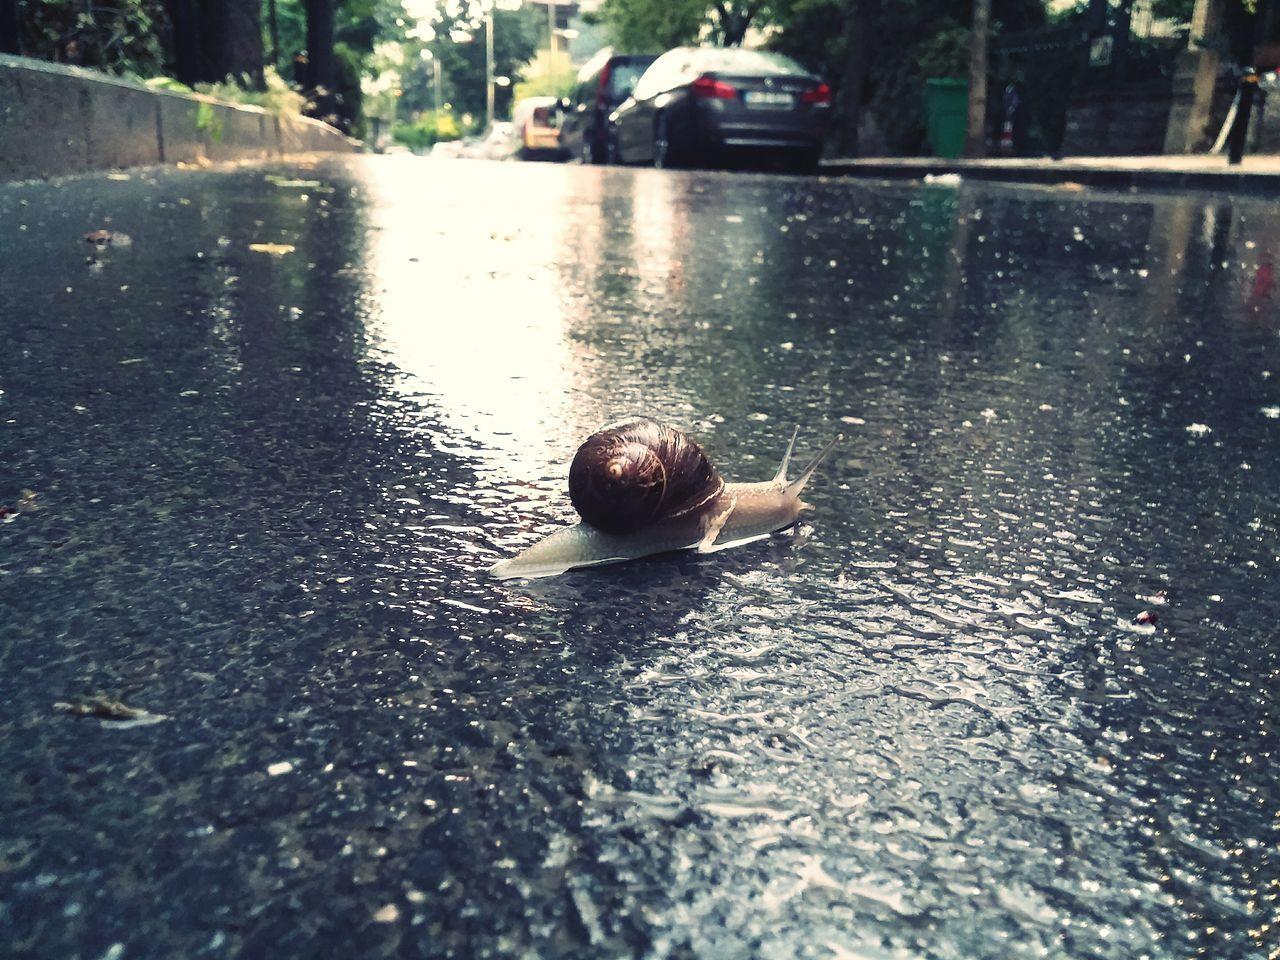 Wet Taking Photos Afterrain Rainy Day Enjoying Life Naturephotography Micro Nature Snail Istanbul City Nature_perfection